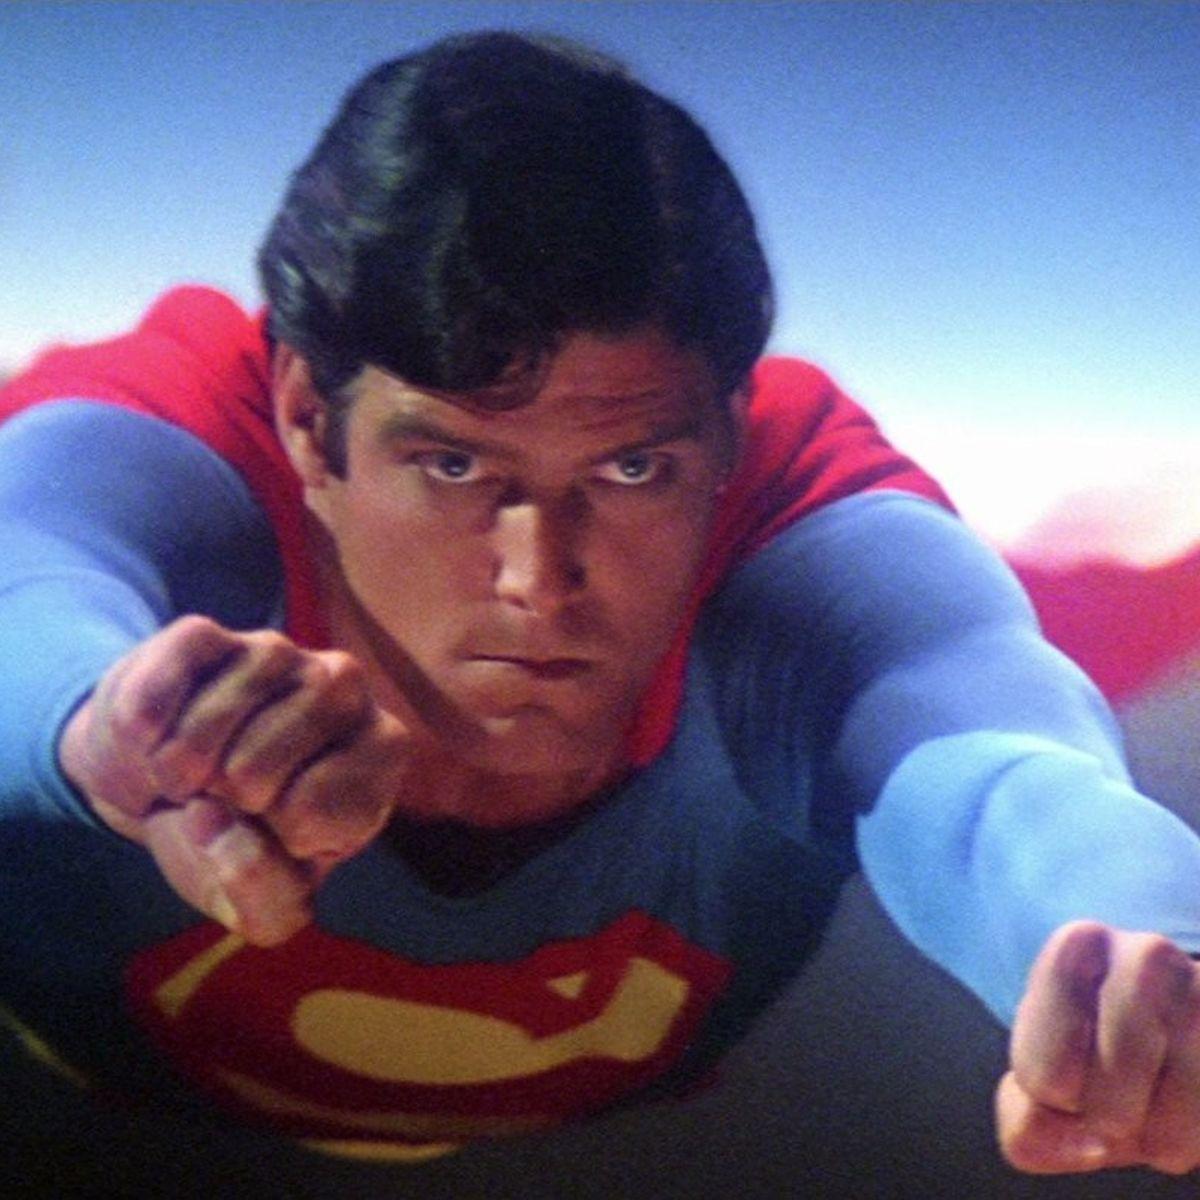 Clark Kent Apuada, 10, breaks Michael Phelps' longest-standing record